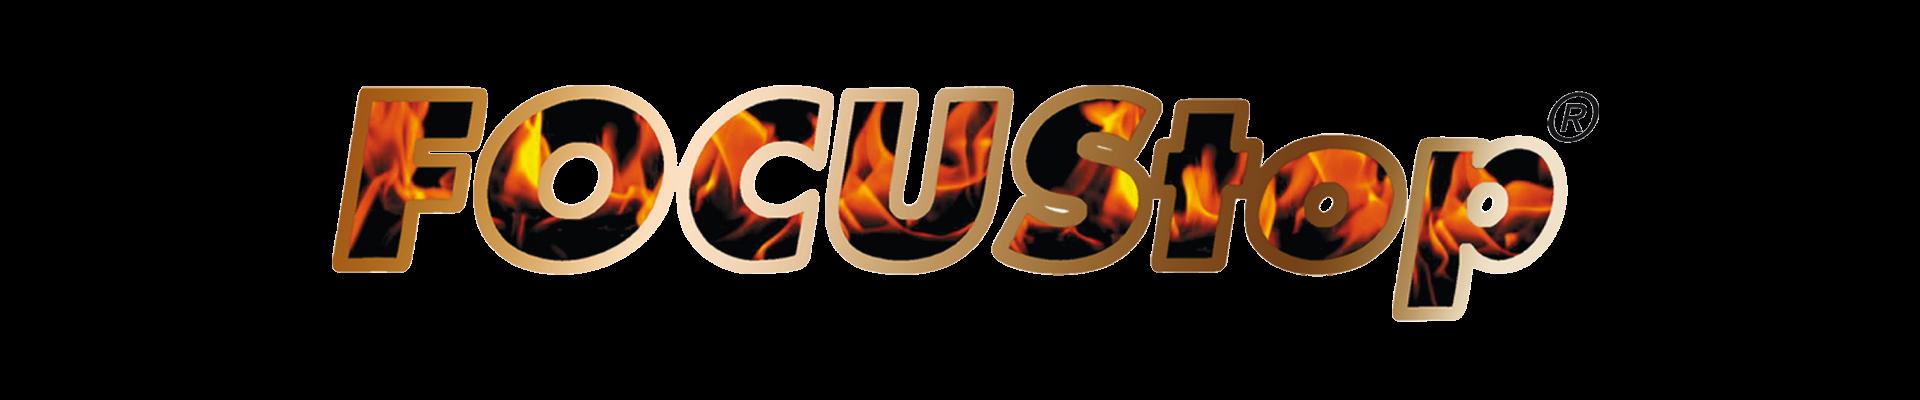 FOCUSTOP LOGO (R)